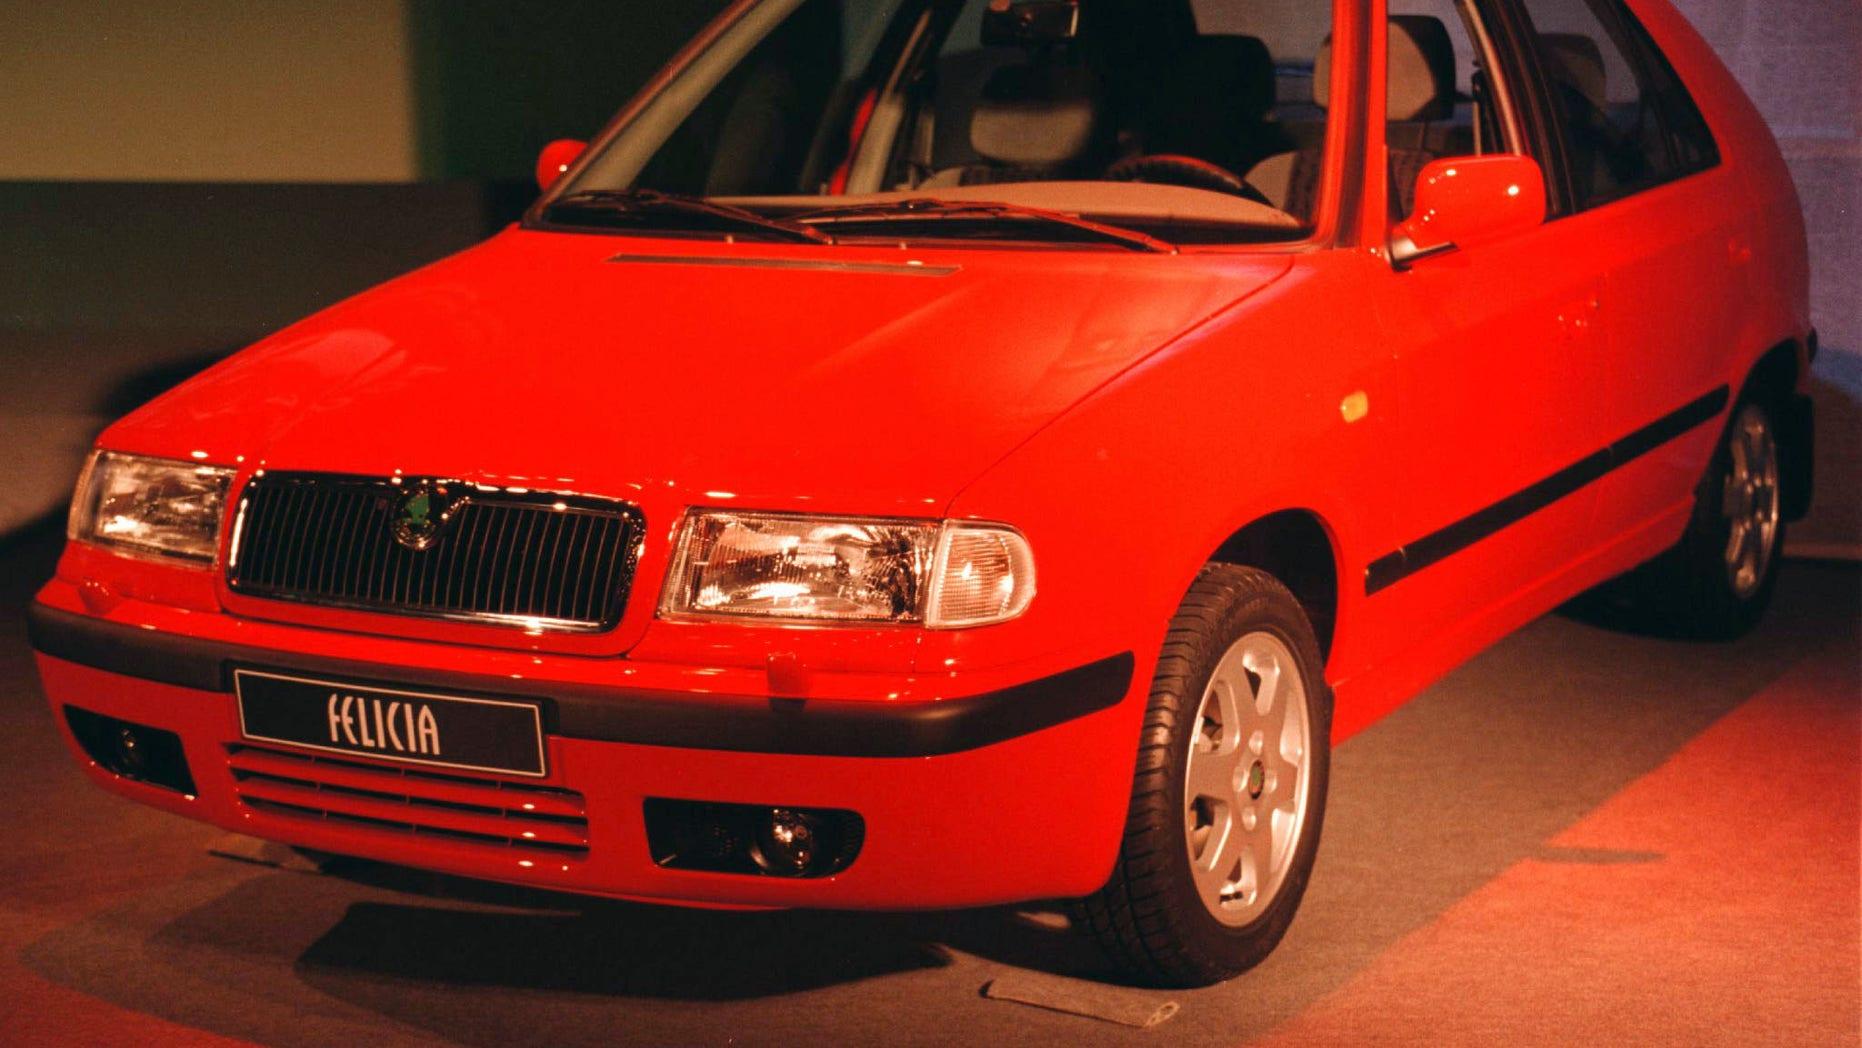 A Skoda Felicia on display in 1998.